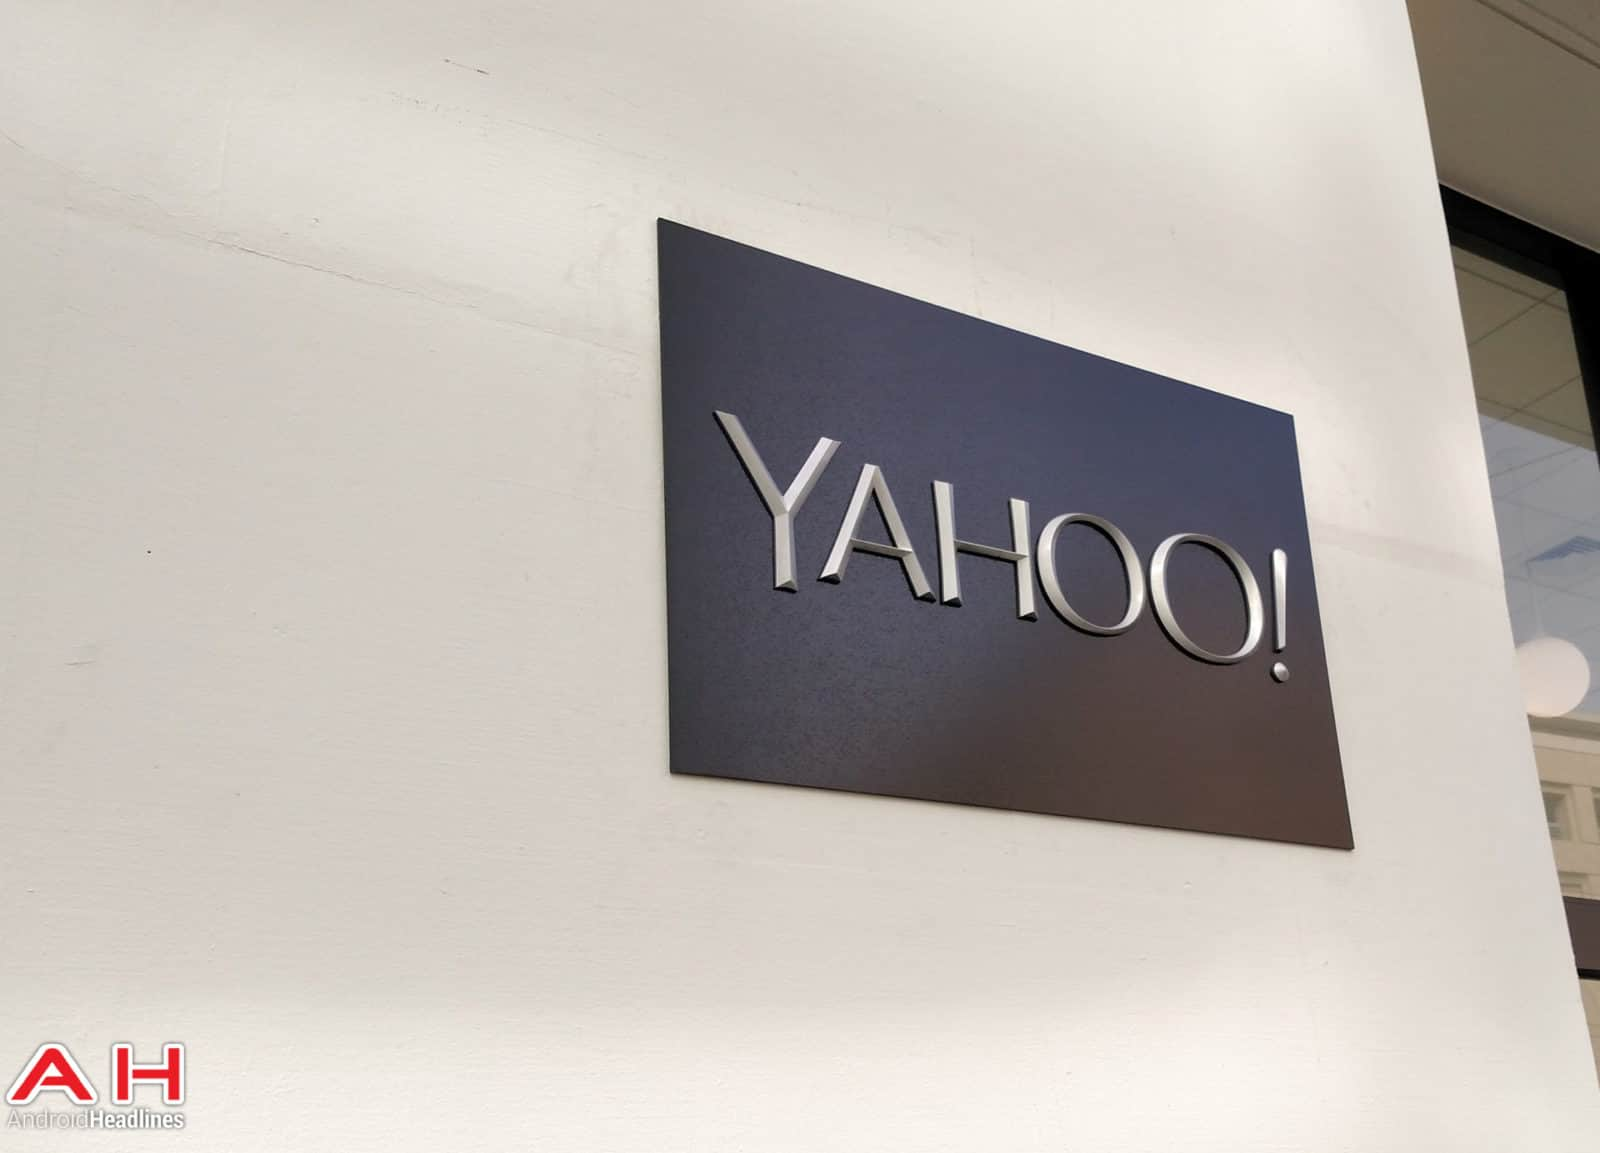 Yahoo-AH-132929246